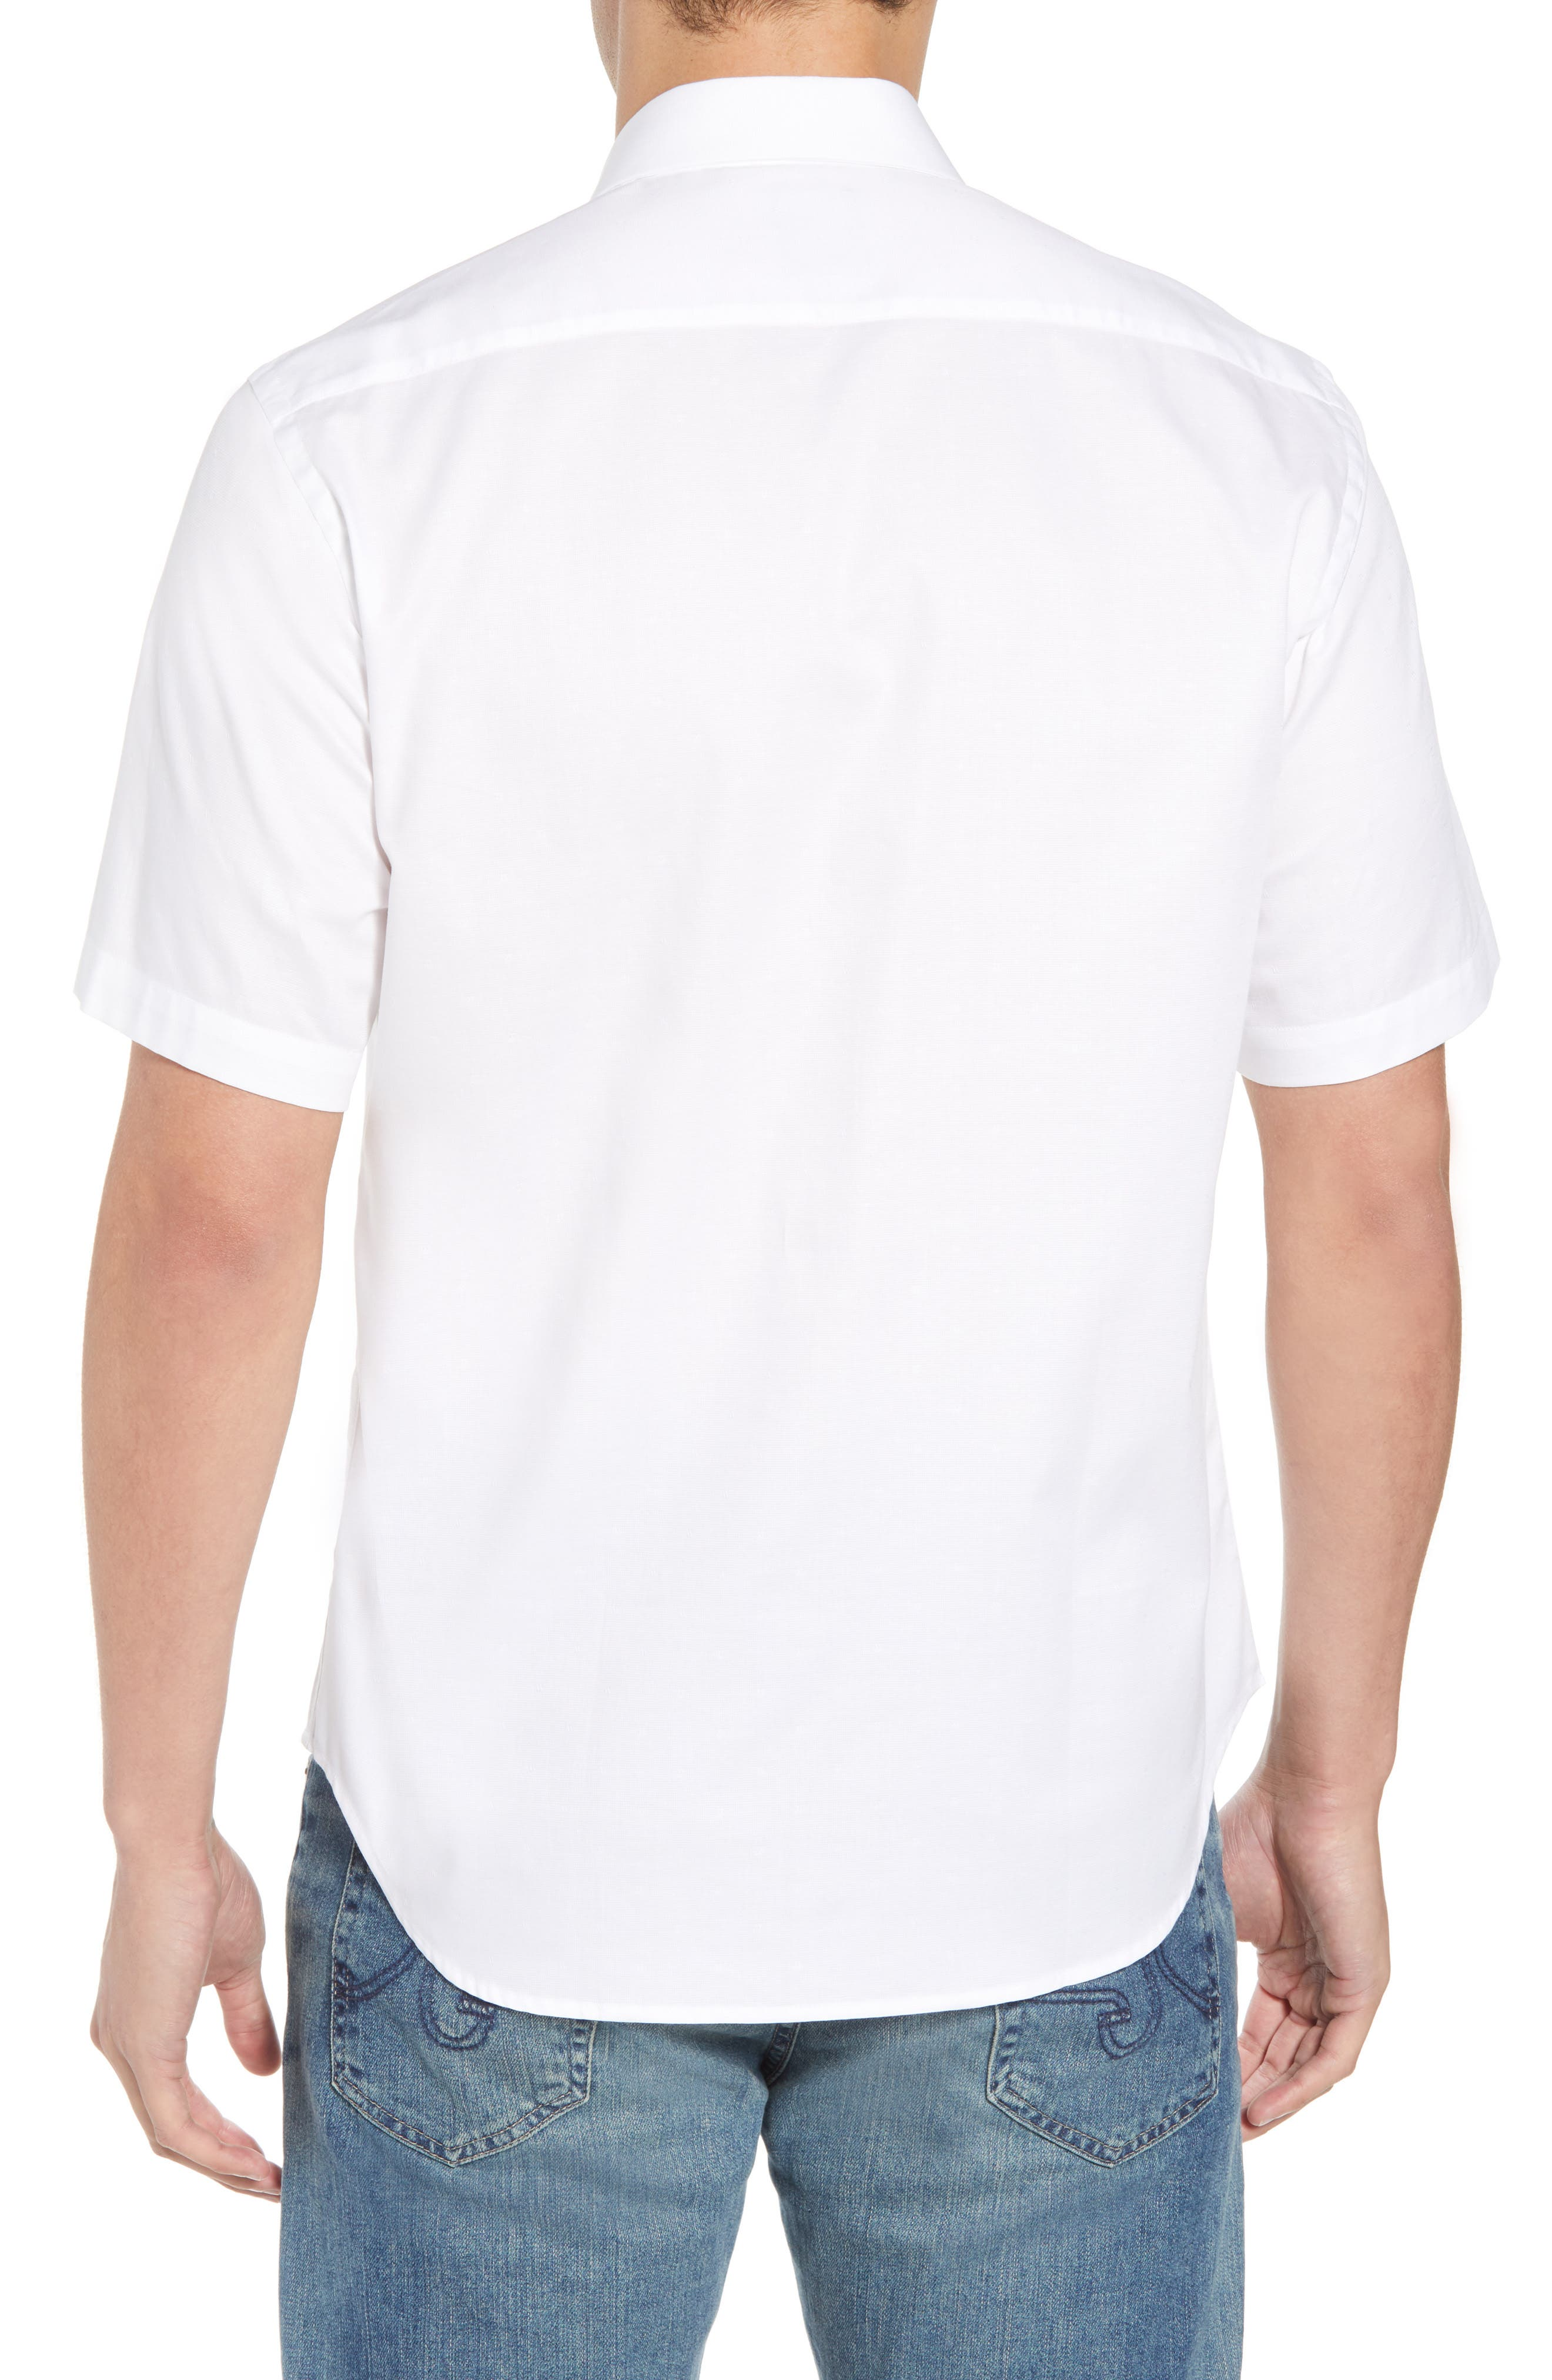 Arlen Regular Fit Sport Shirt,                             Alternate thumbnail 2, color,